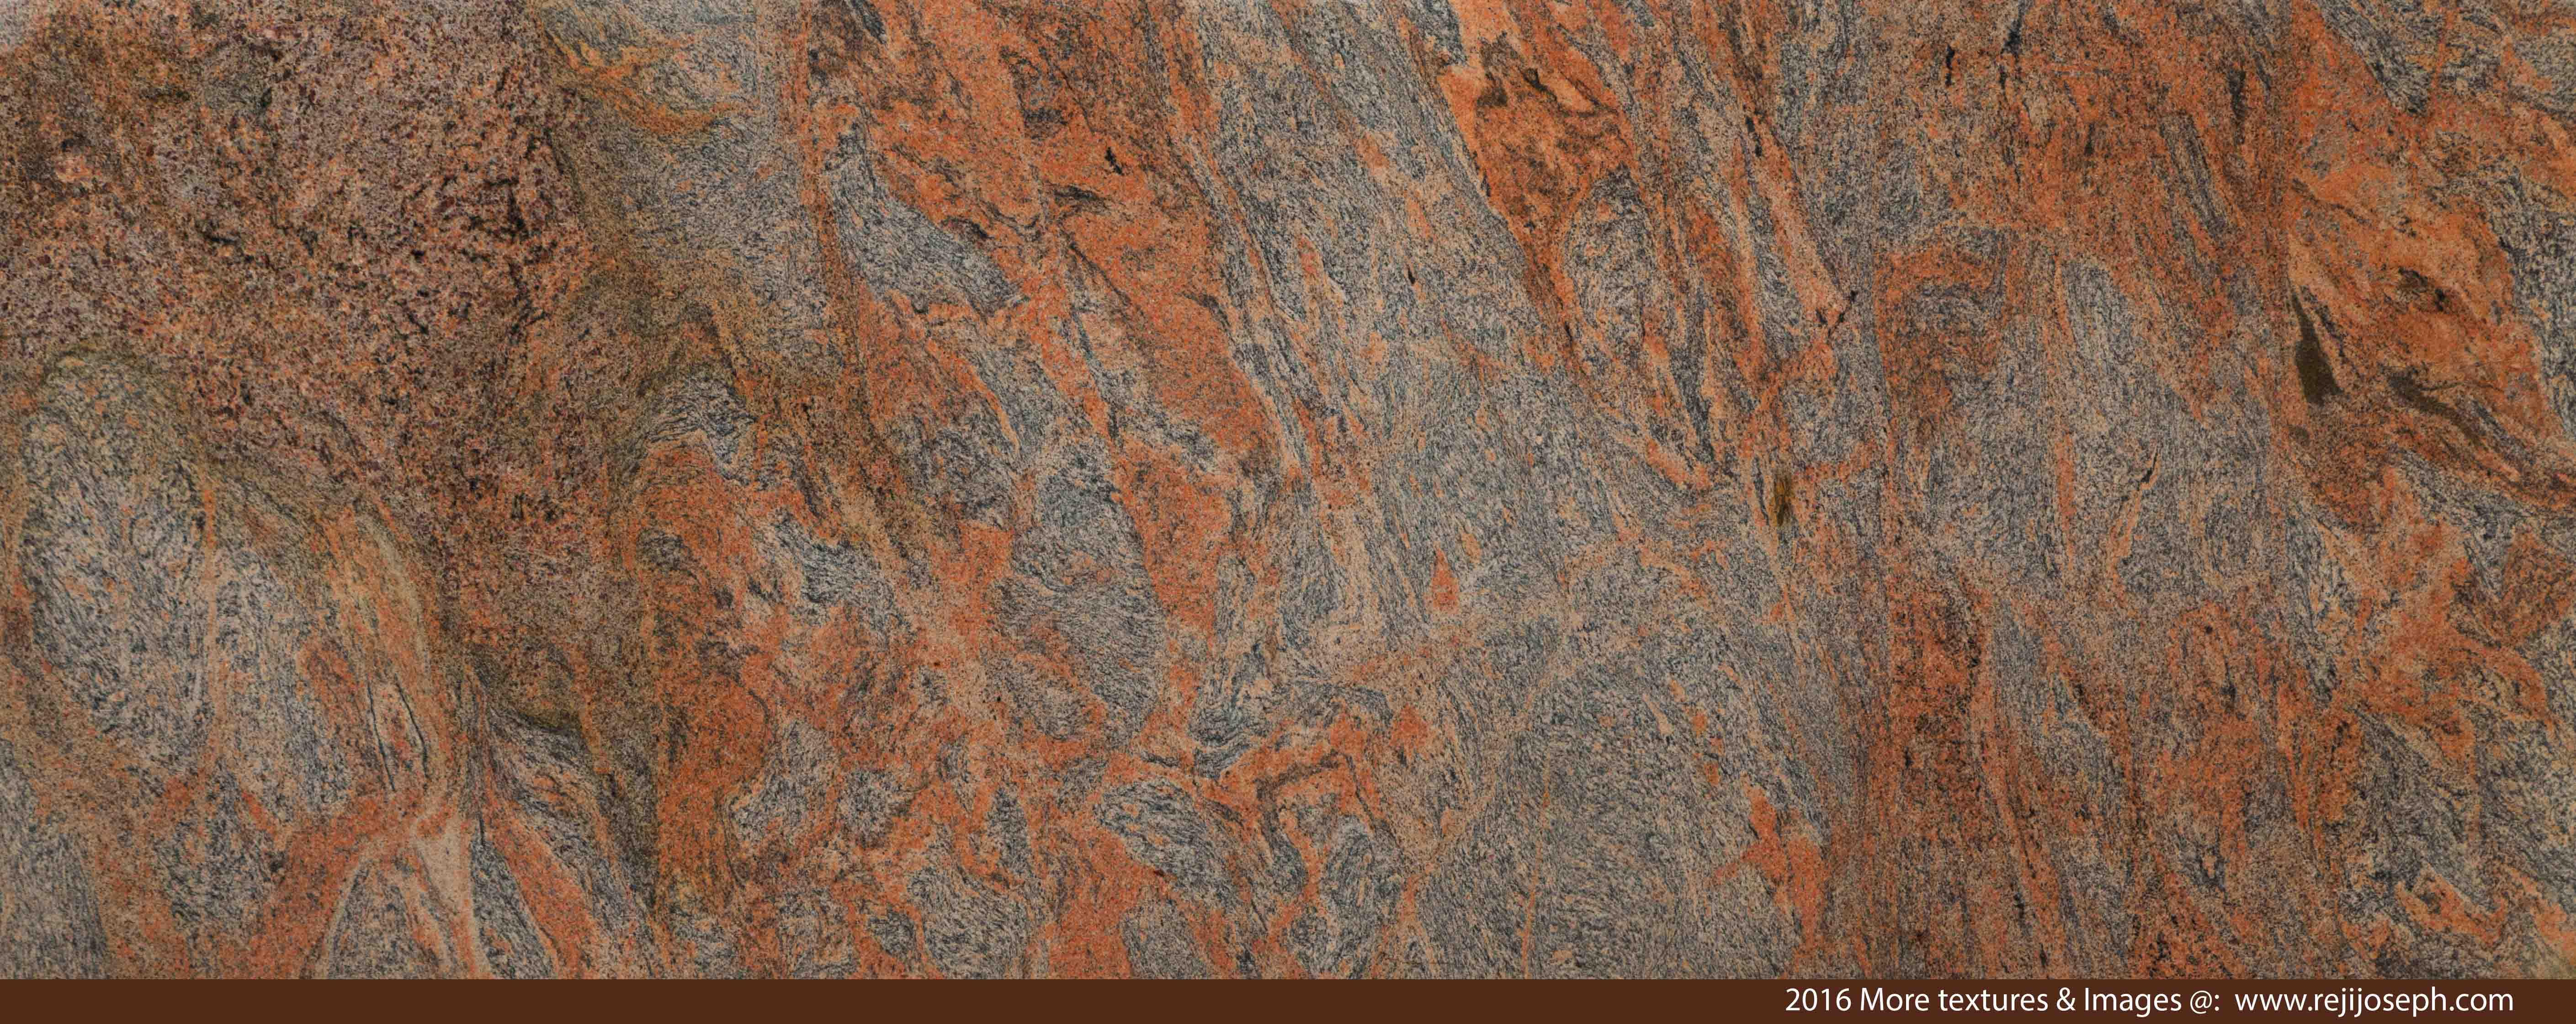 Marbles Granites Texture 00080